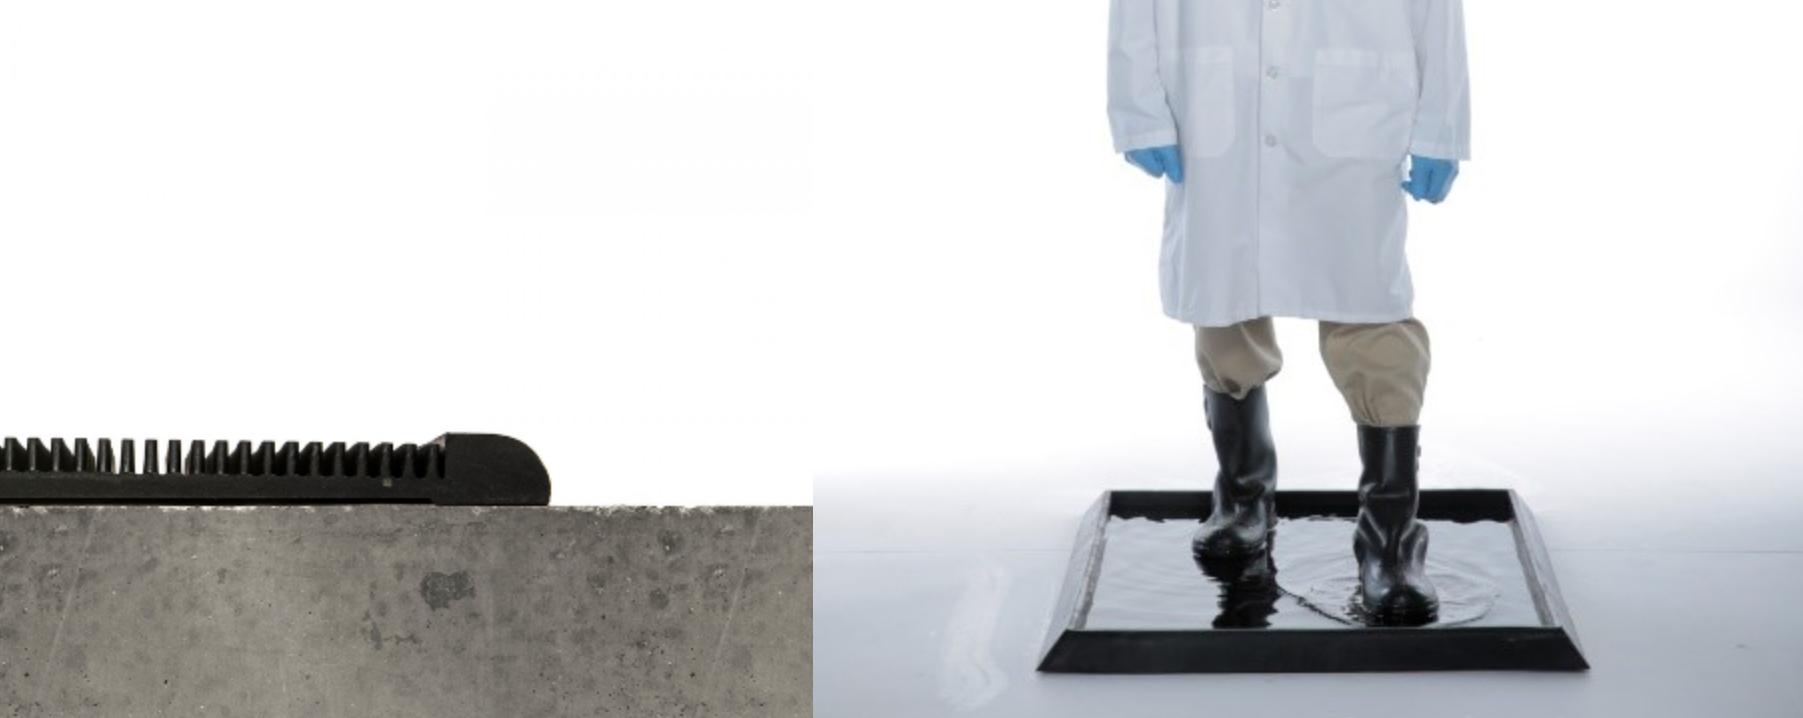 sanitizing mat, disinfecting mat, clean room mat,